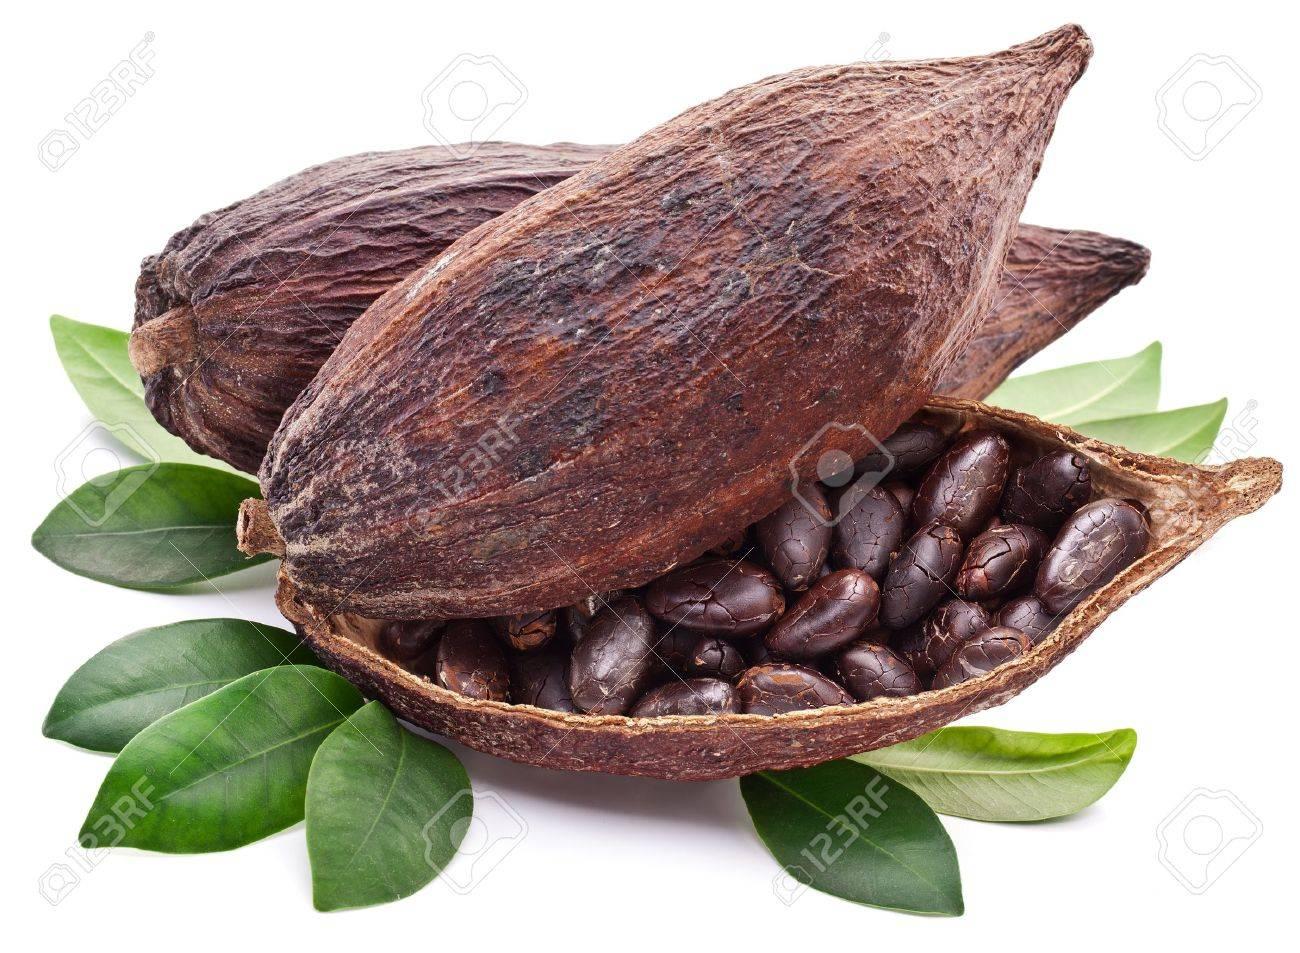 cocoa pod on a white background stock photo